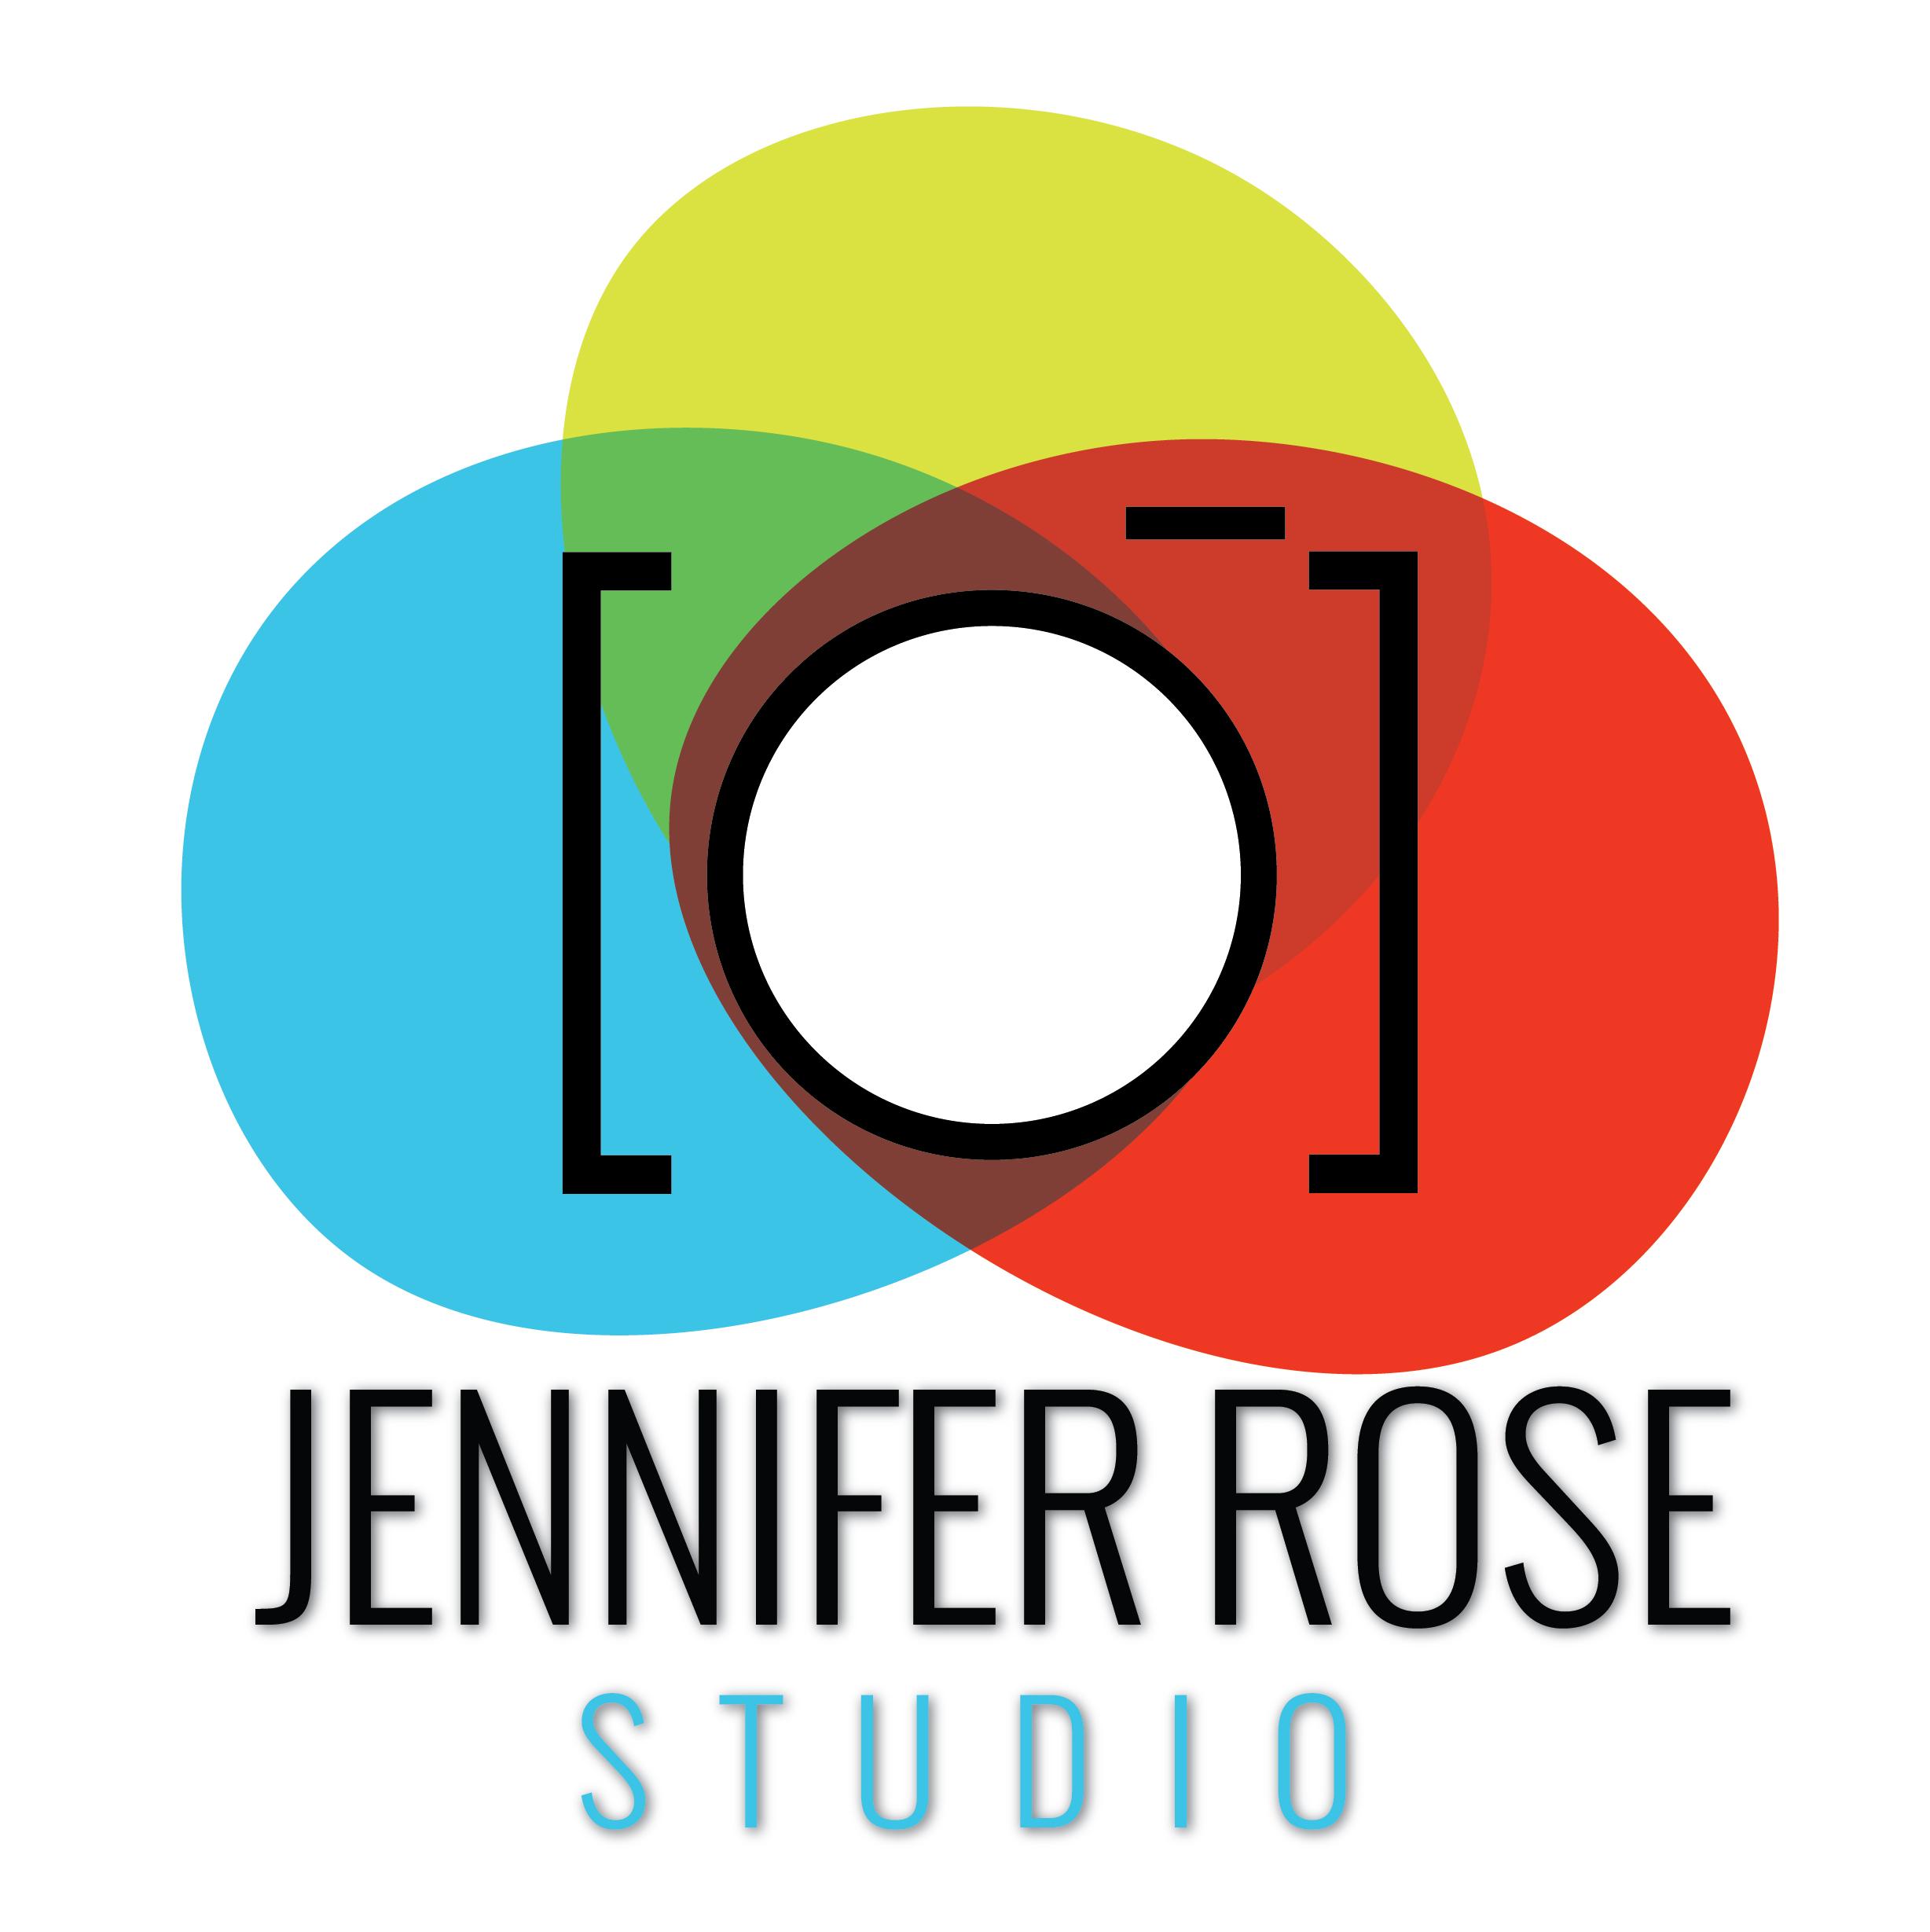 Jennifer Rose Studio - FB Profile Pic.jpg